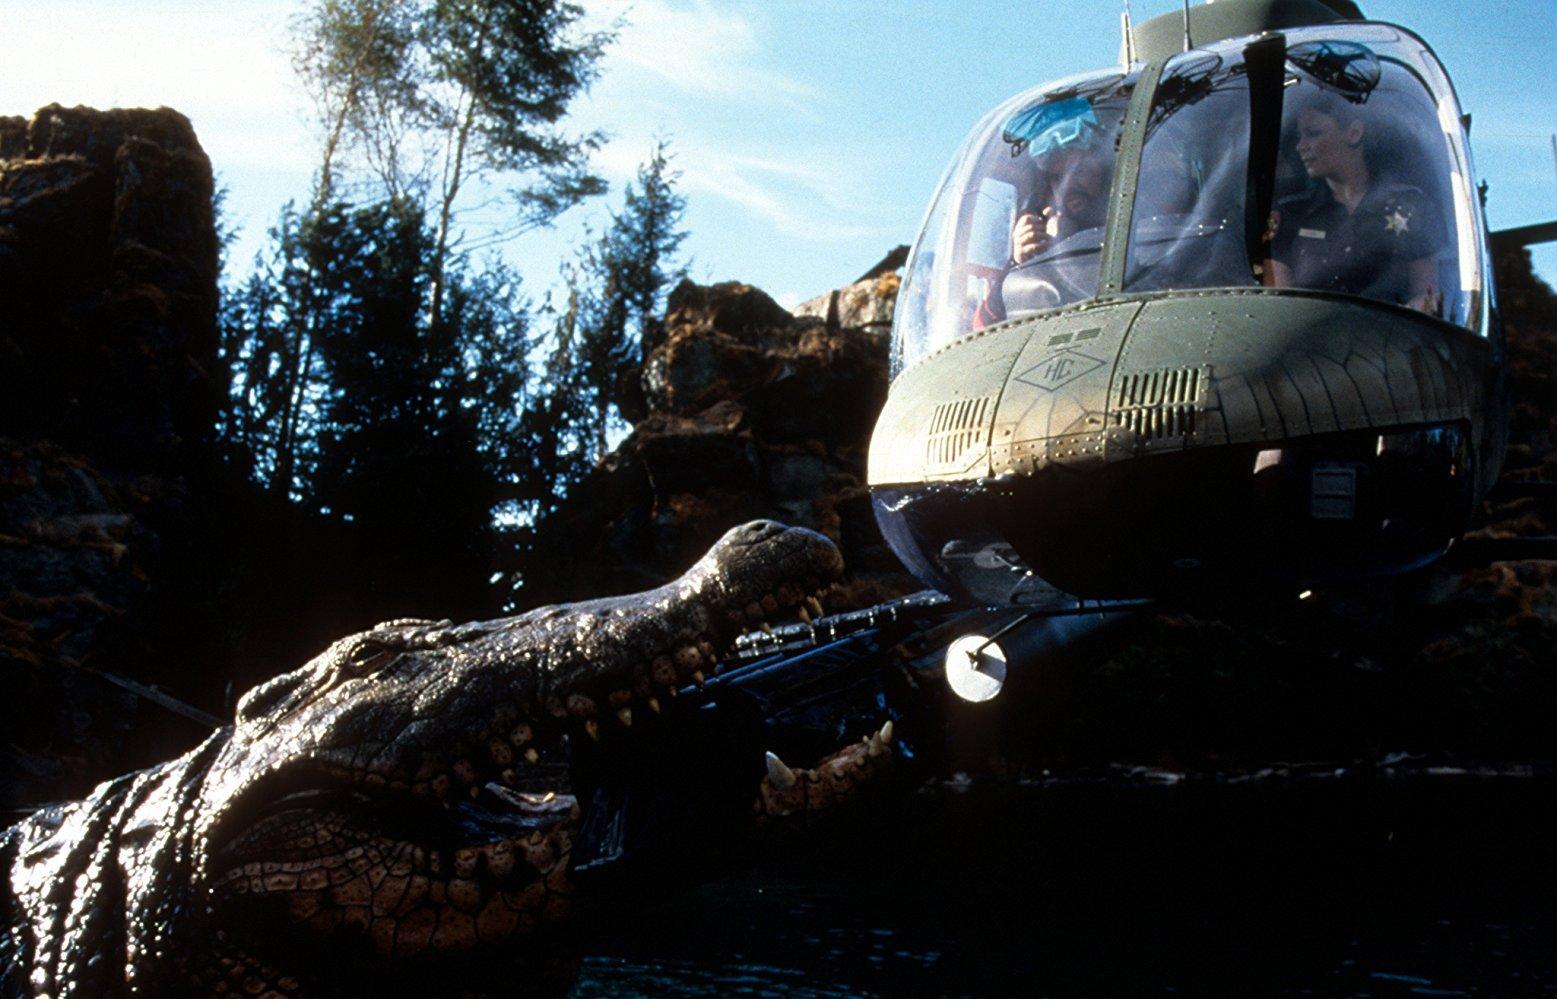 Giant crocodile vs helicopter in Lake Placid (1999)